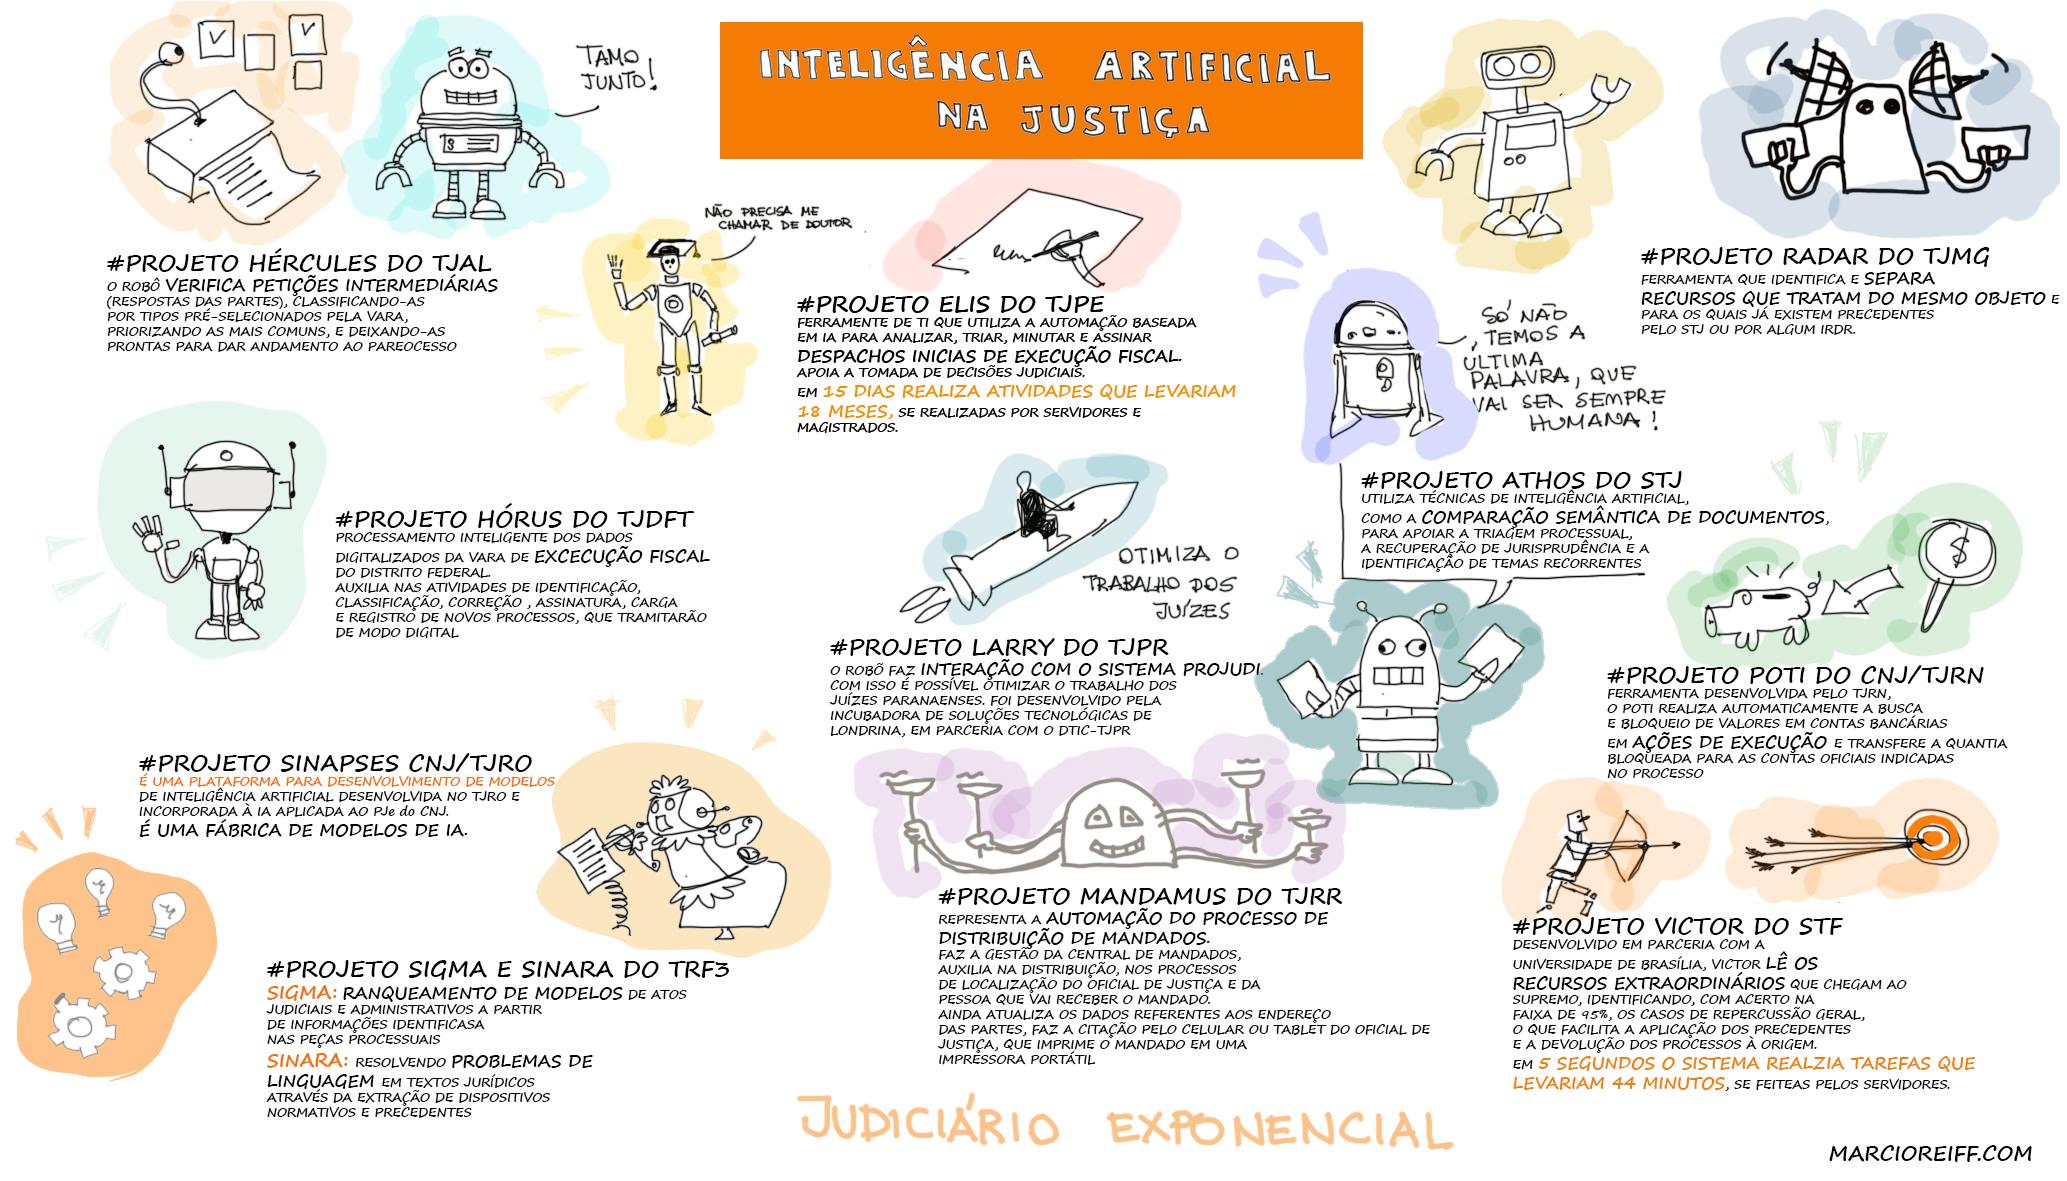 INTELIGÊNCIA_ARTIFICIAL_NA_JUSTIÇA_-_W